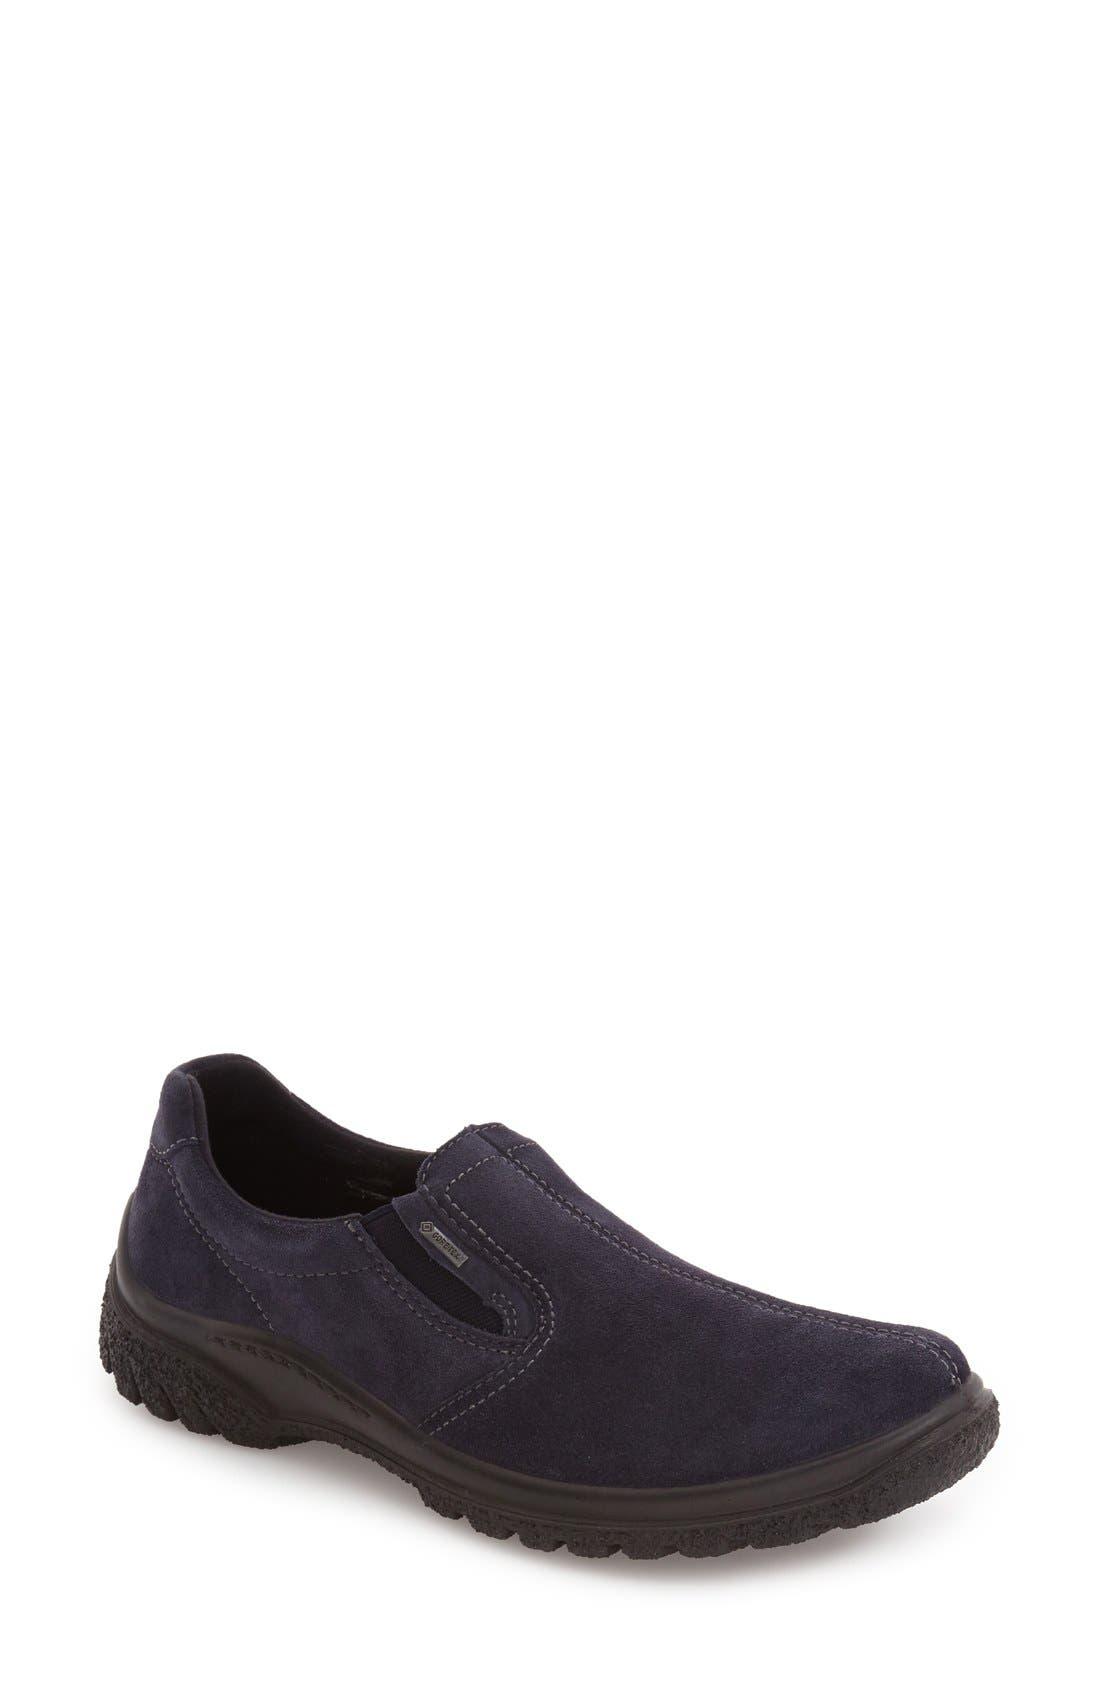 Parson Waterproof Gore-Tex<sup>®</sup> Slip-On Sneaker,                         Main,                         color, NAVY SUEDE